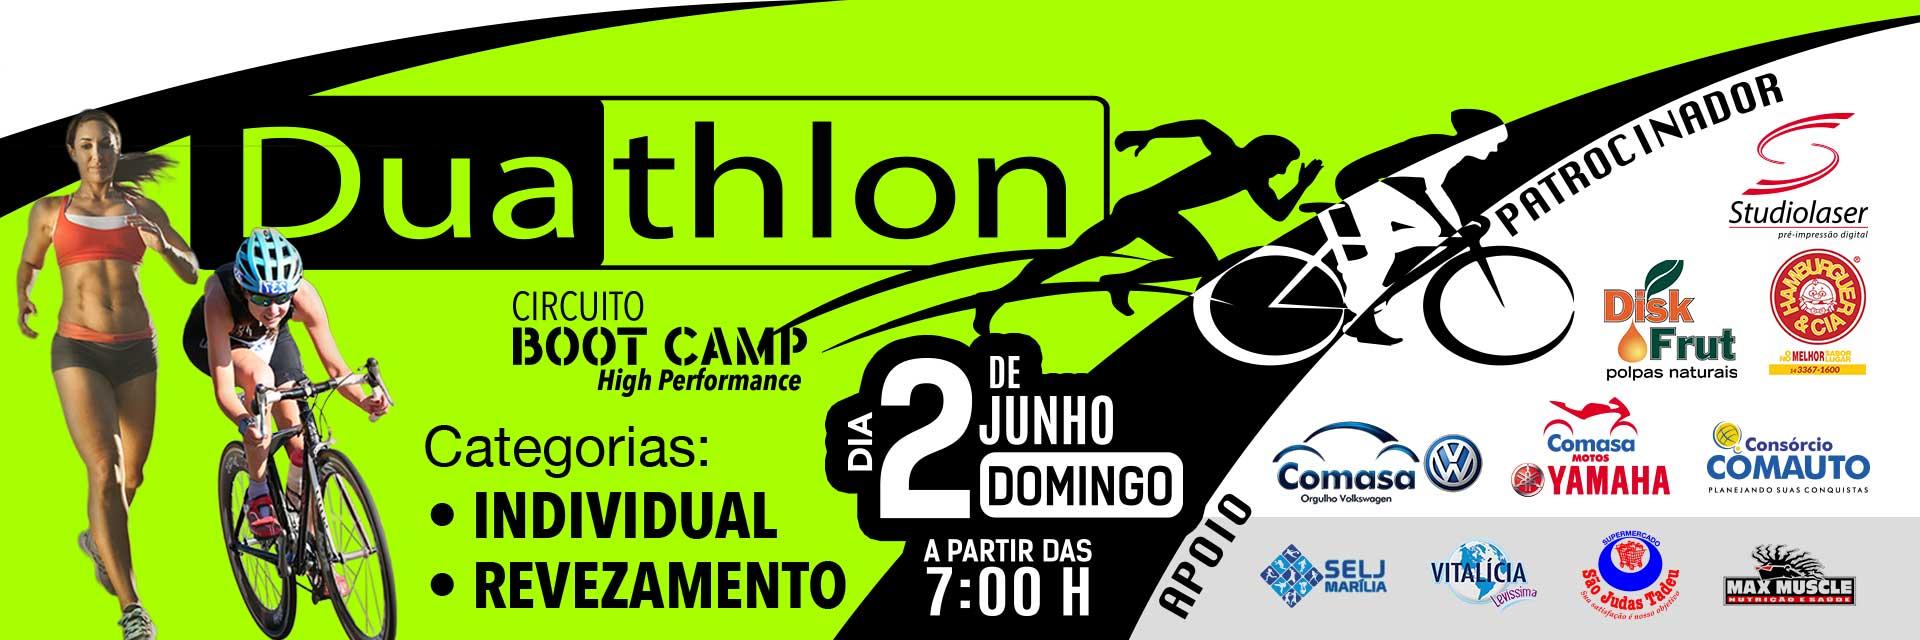 DUATHLON Yara Circuito High Performance